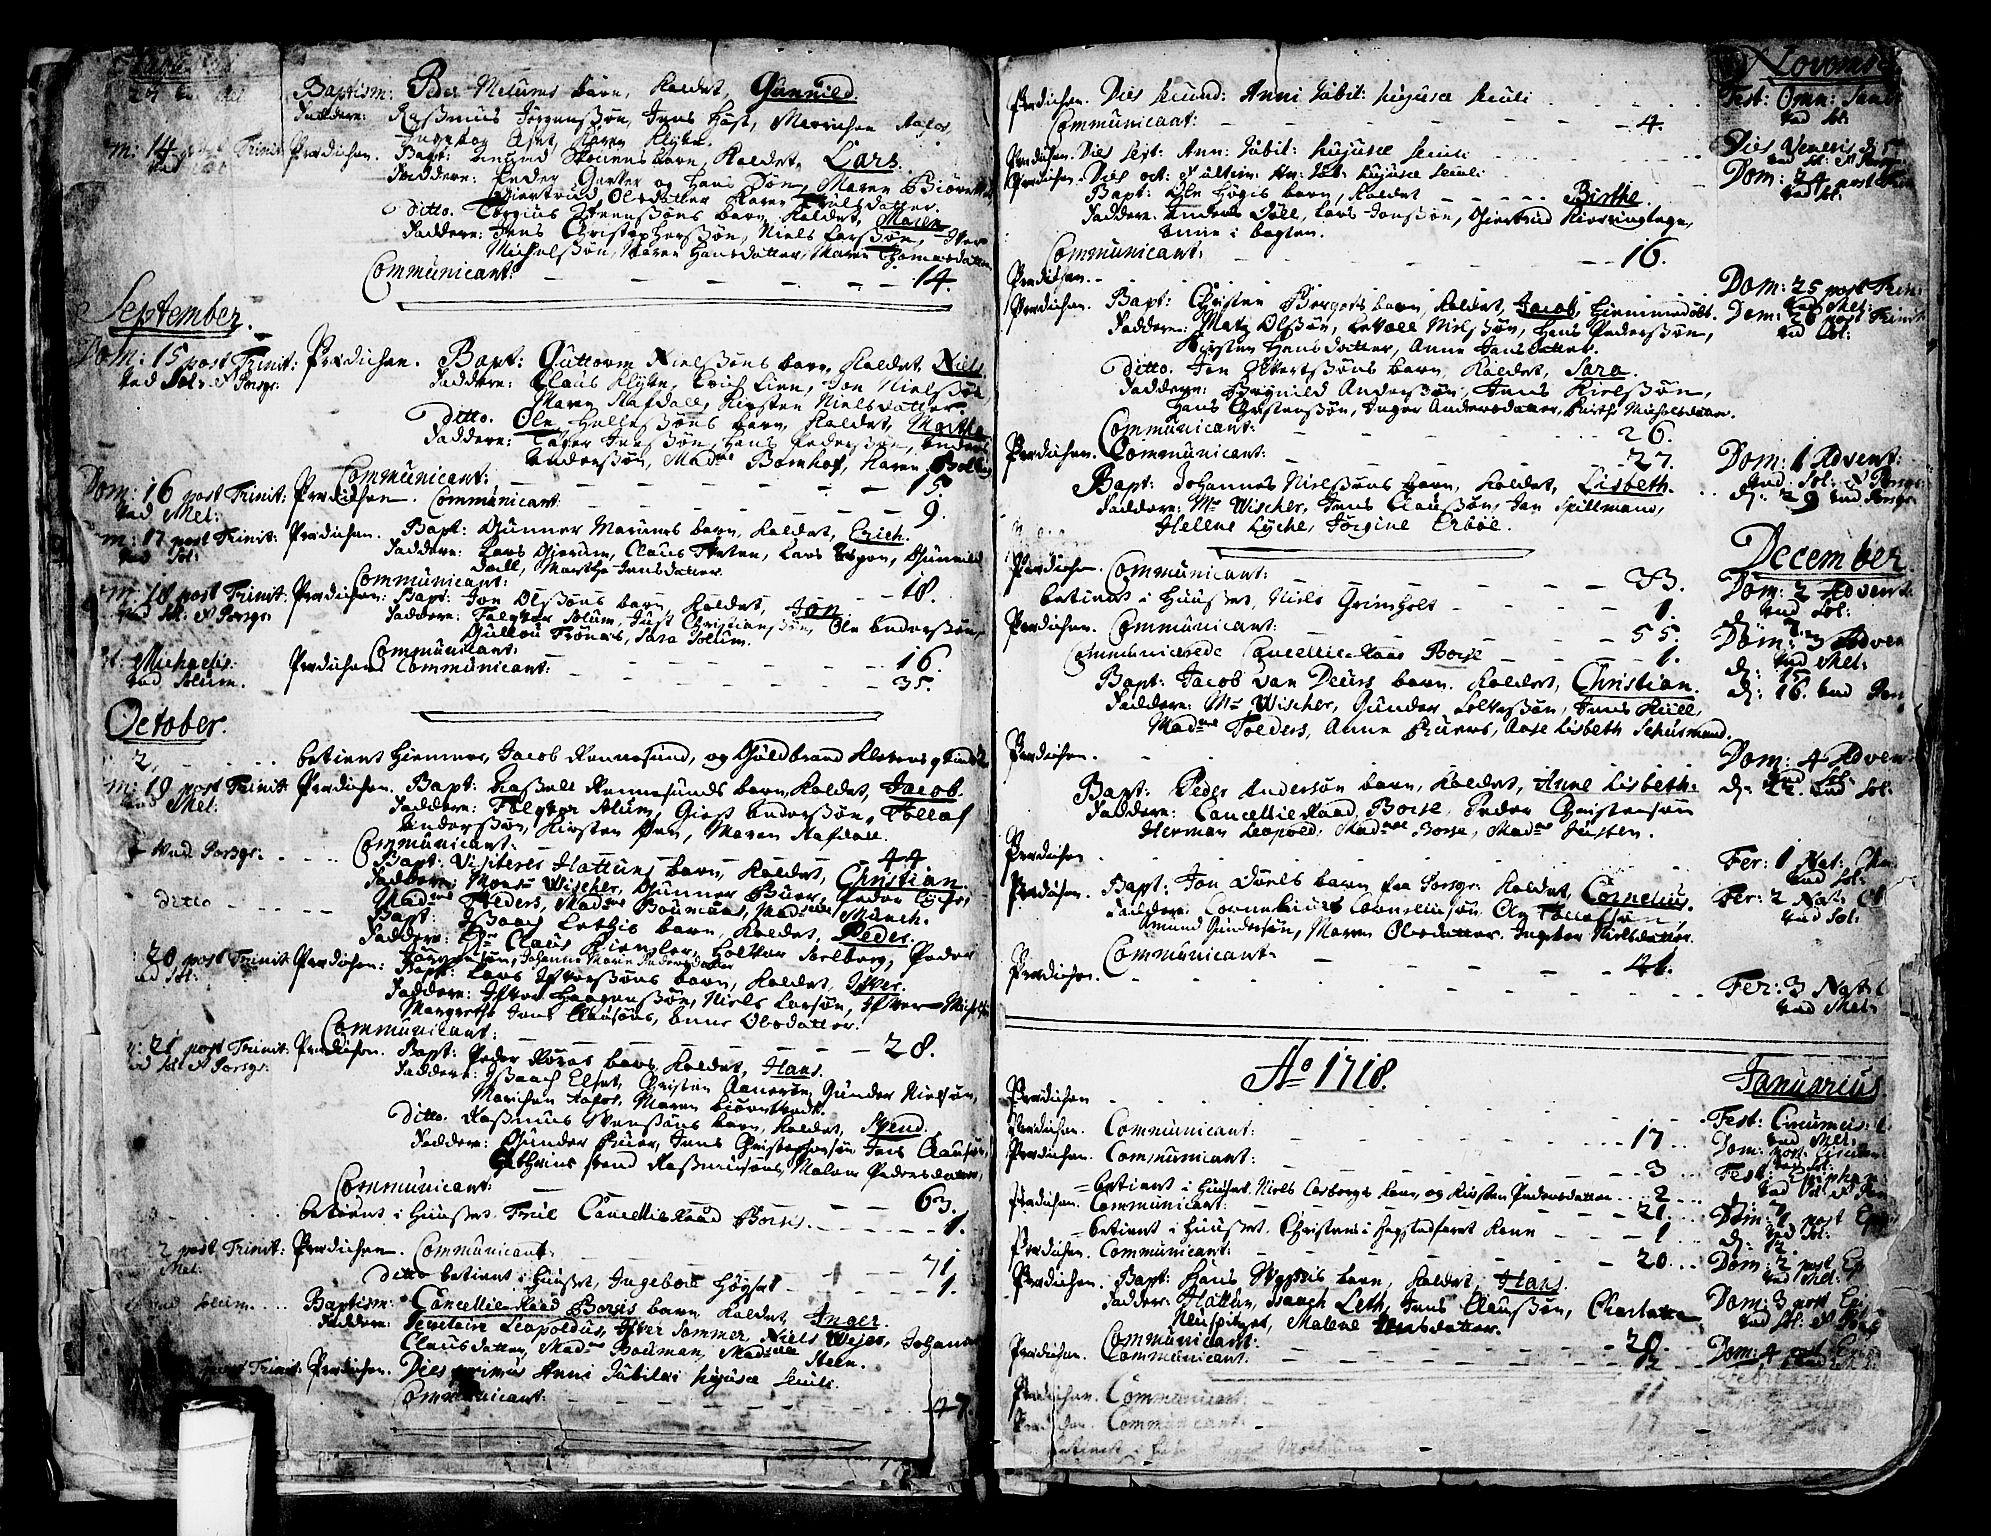 SAKO, Solum kirkebøker, F/Fa/L0002: Ministerialbok nr. I 2, 1713-1761, s. 11